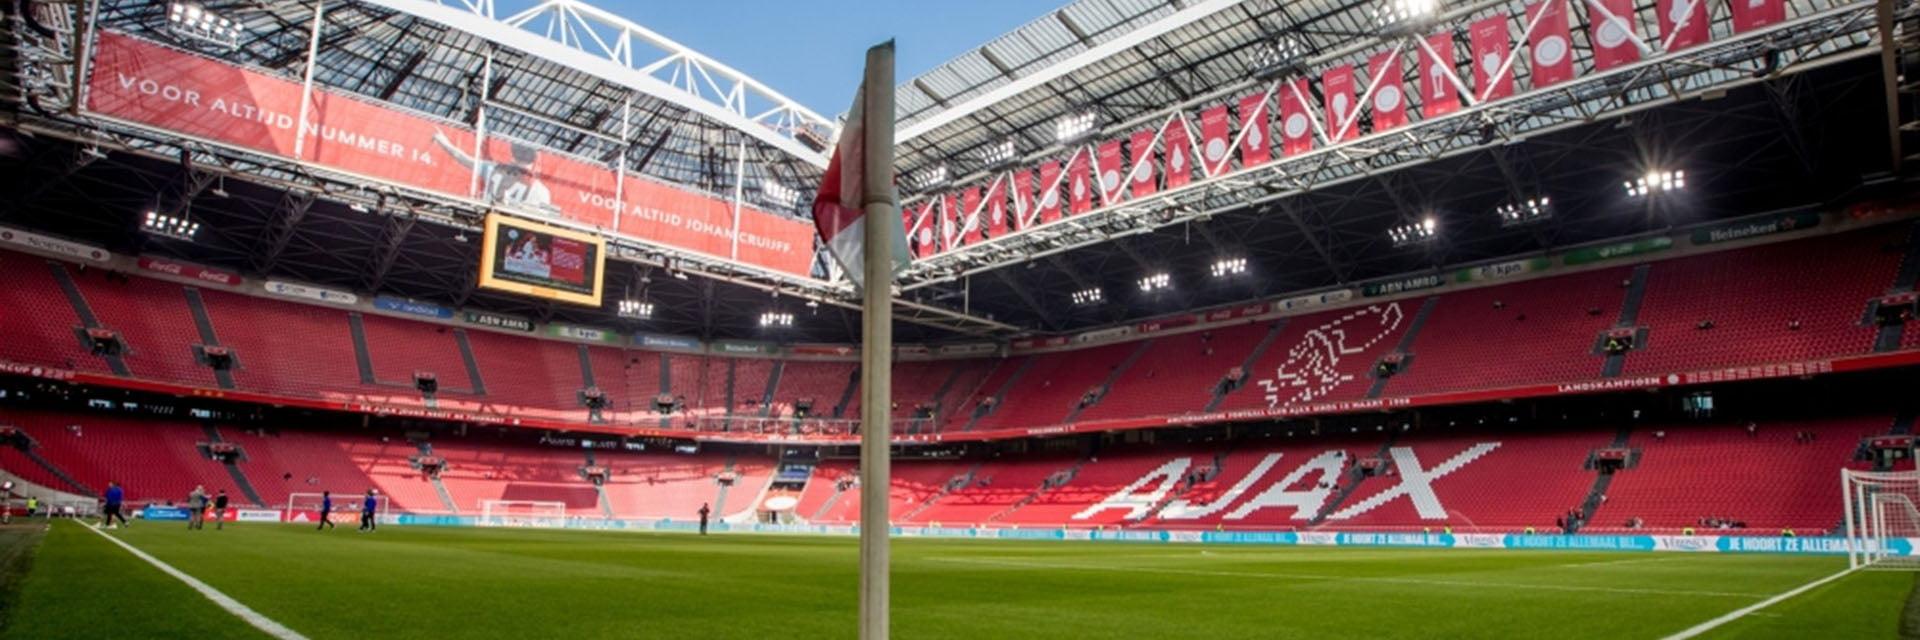 AFC Ajax - Sporting CP, 2 Decemberat 21:00